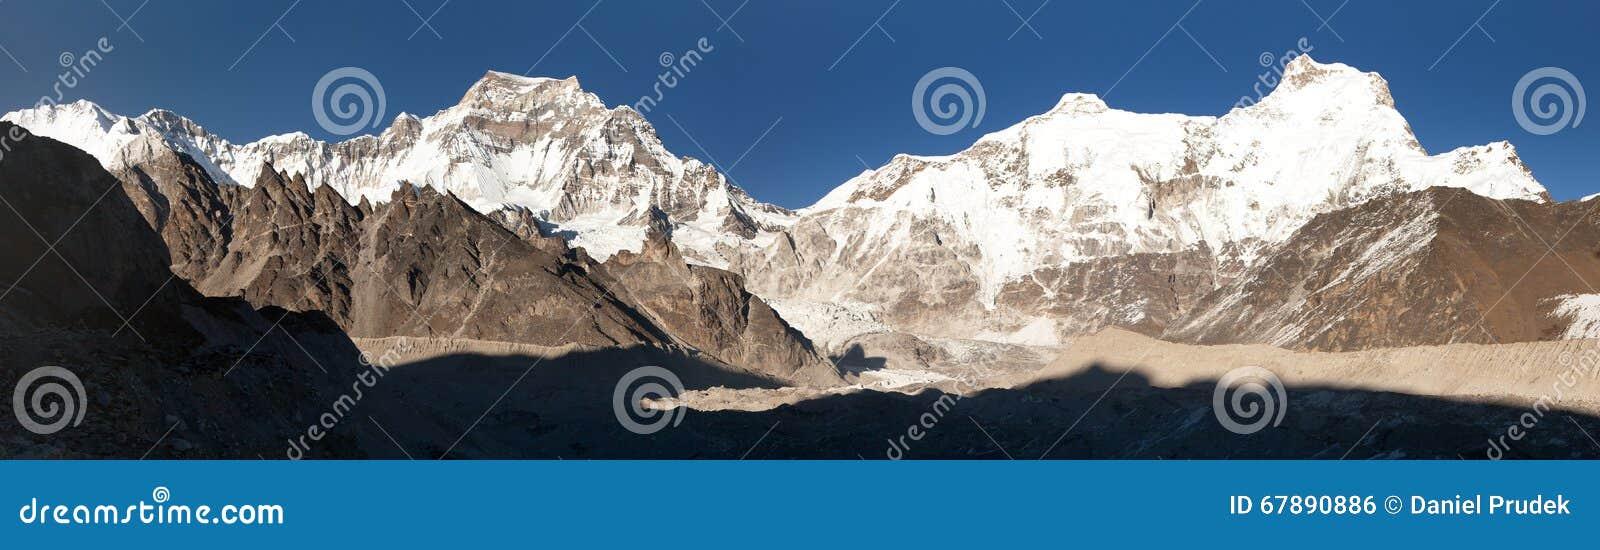 Ngozumba冰川和珠穆朗玛峰,尼泊尔